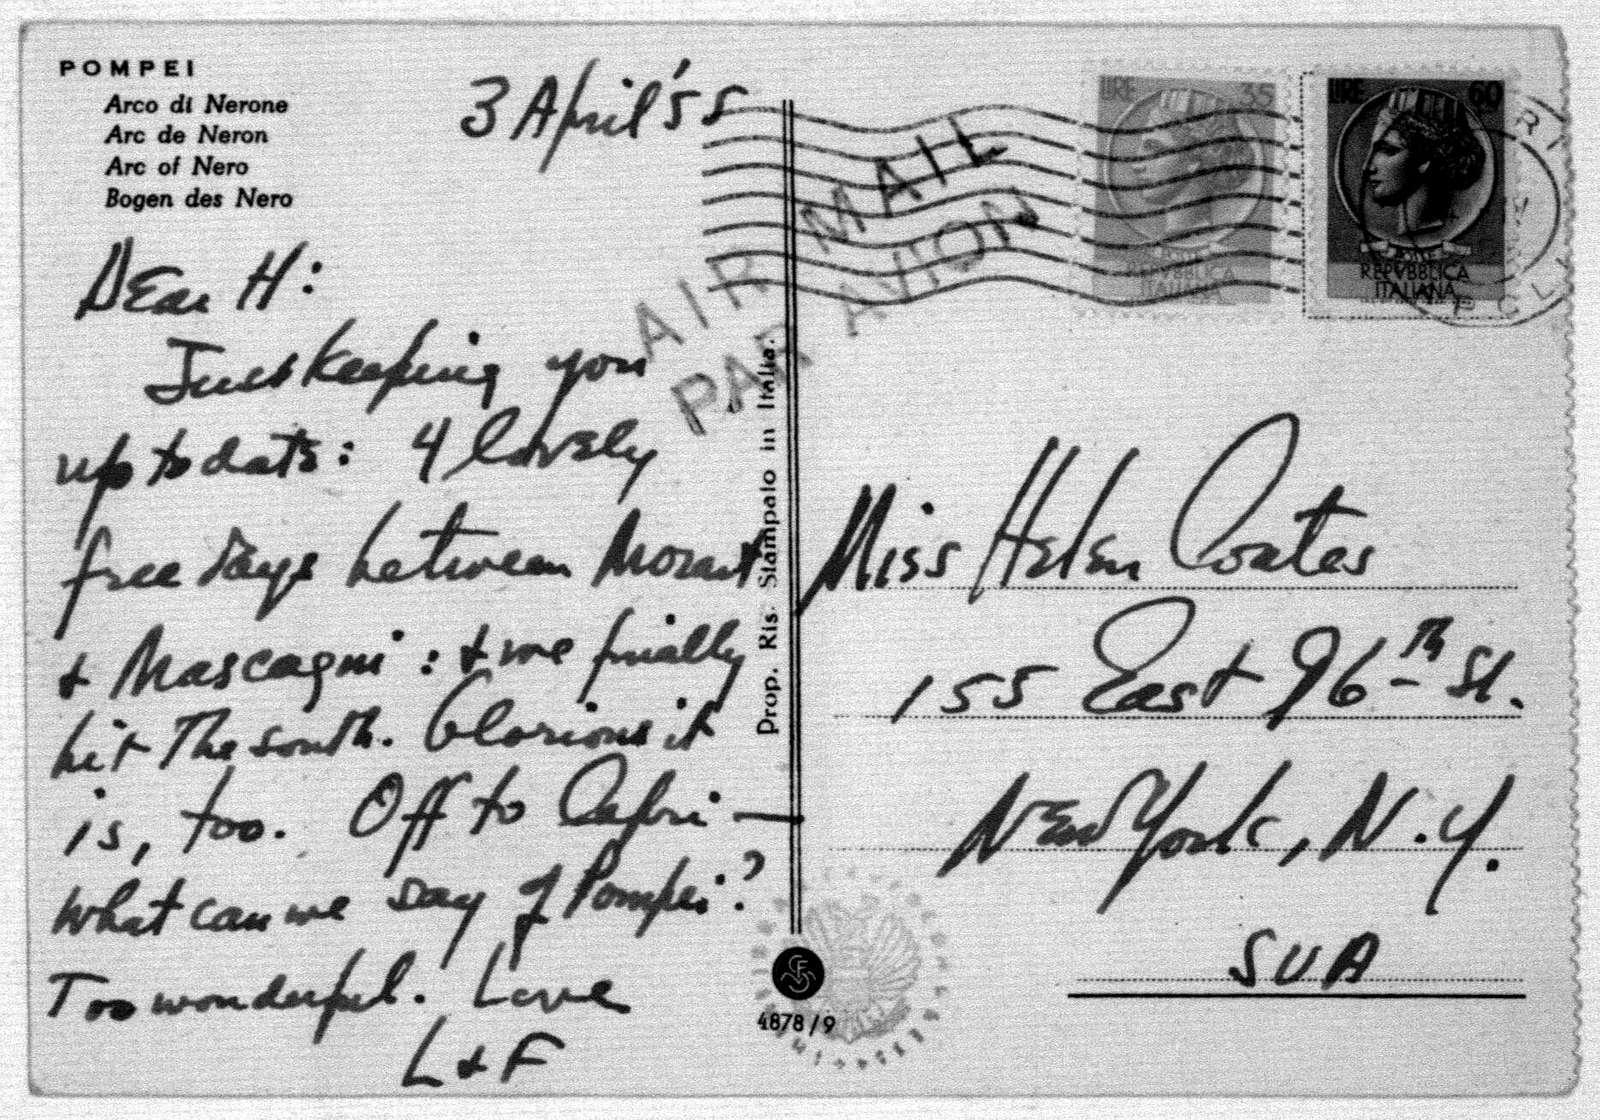 Letter from Leonard & Felicia Bernstein to Helen Coates, April 3, 1955